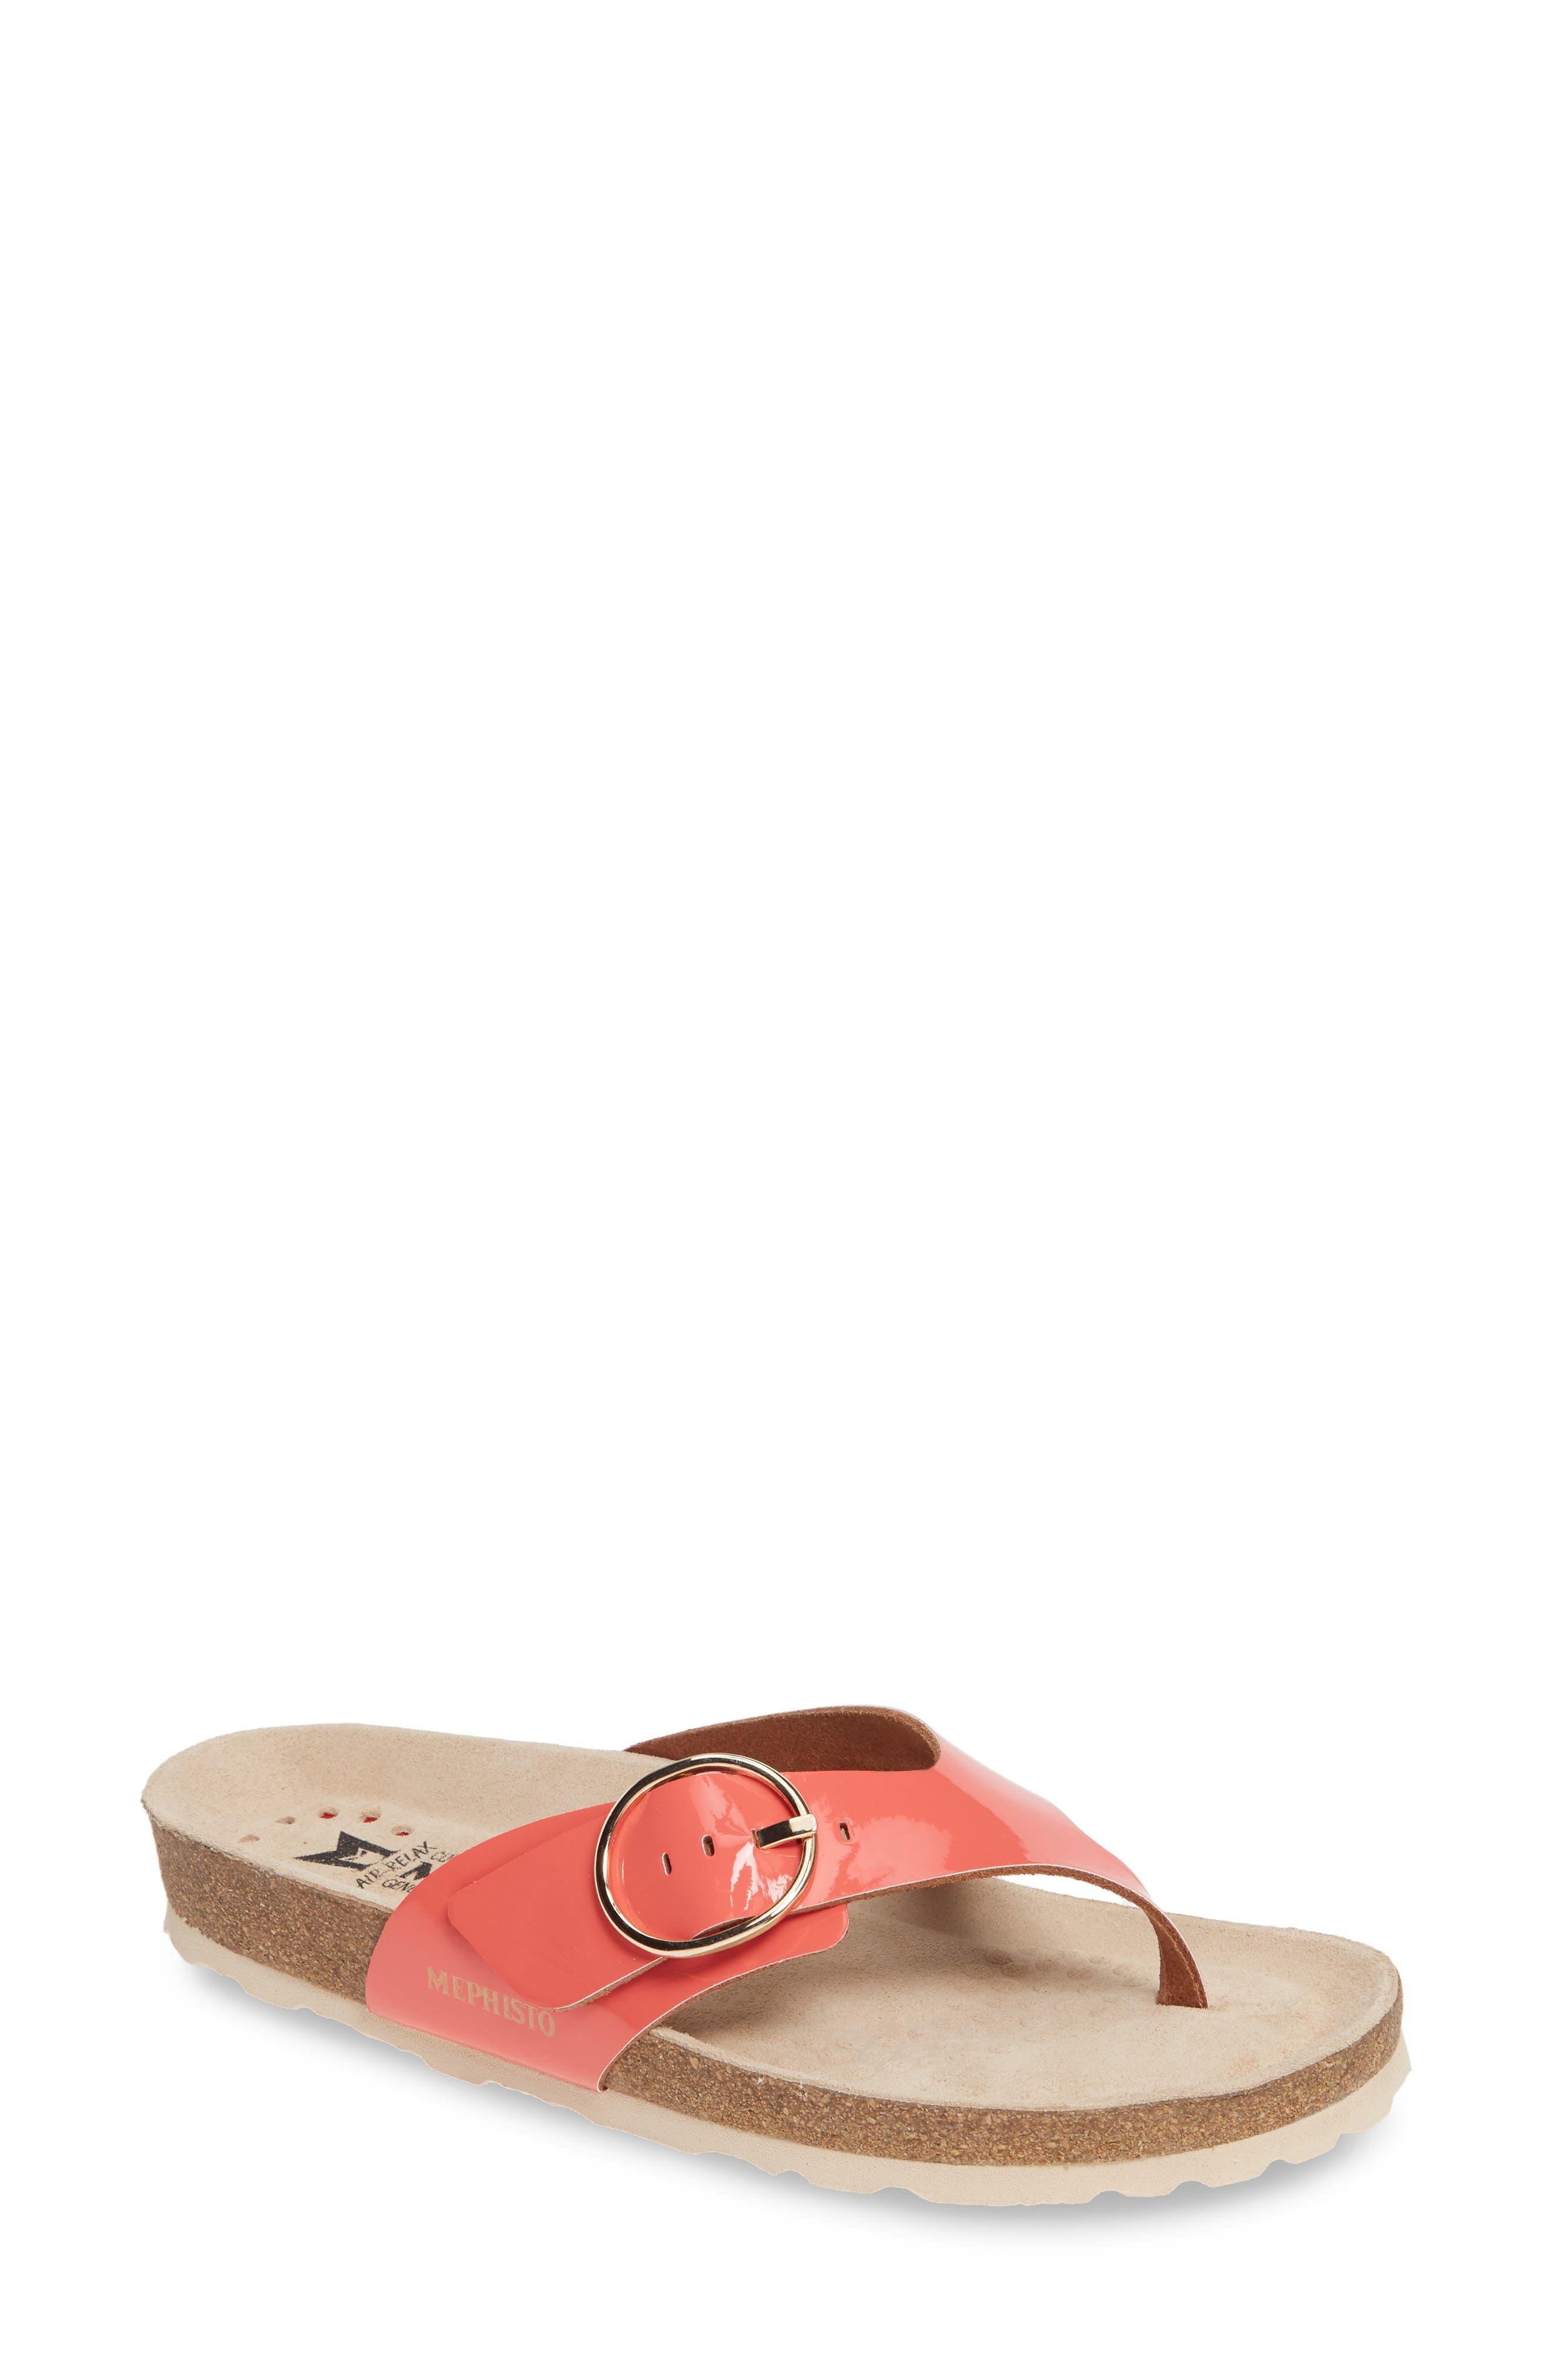 MEPHISTO Natalina Slide Flip Flop, Main, color, CORAL PATENT LEATHER